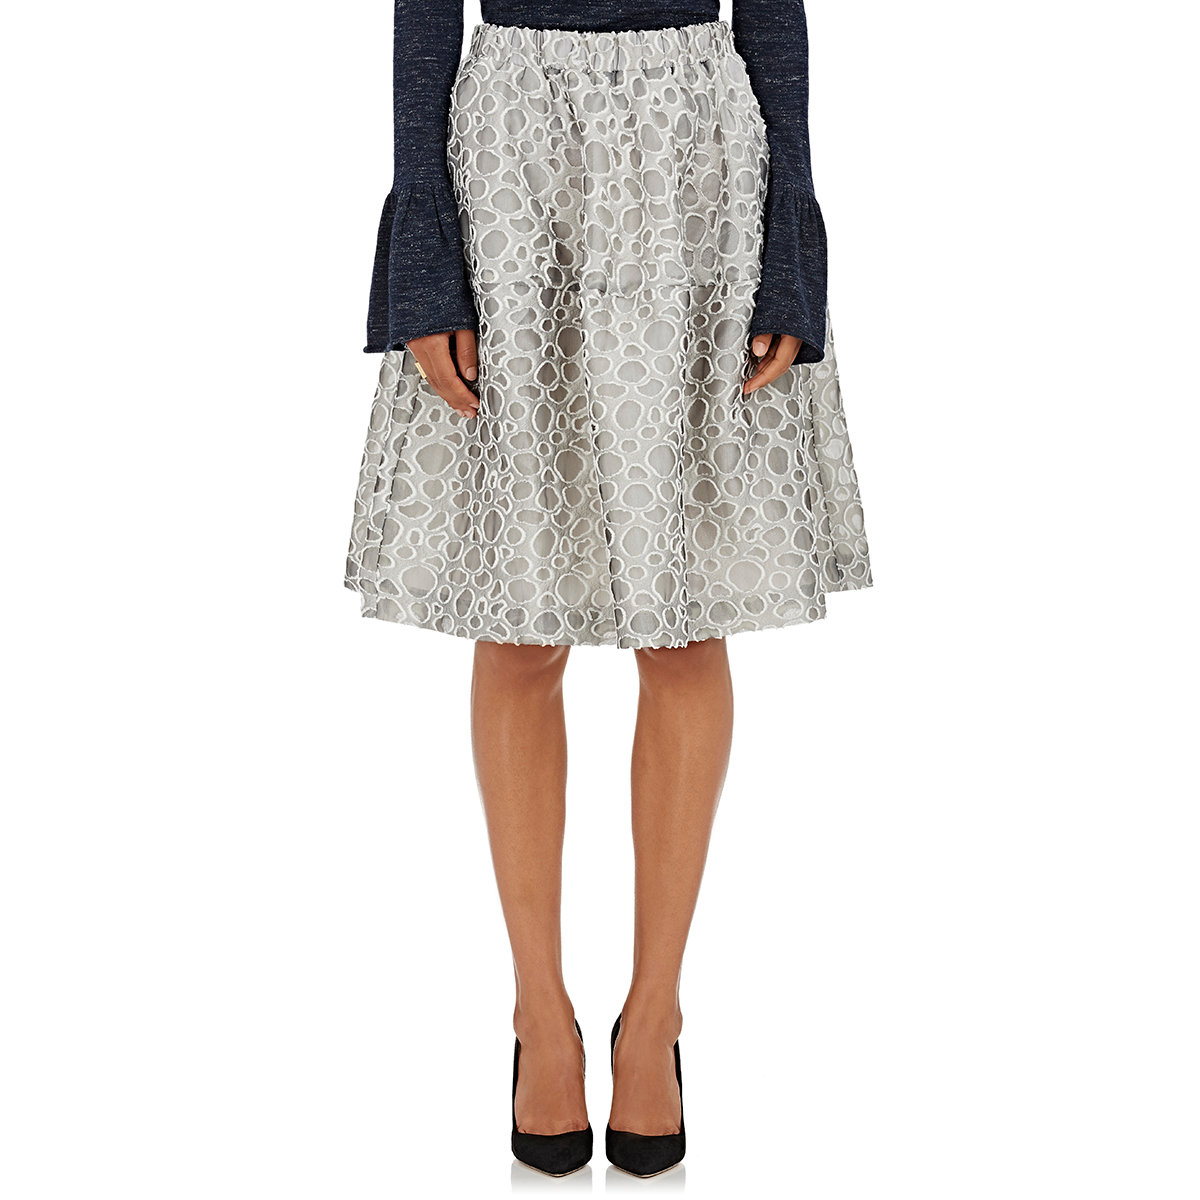 Elegant Womens Wrap ALine Skirt  Womens New Arrivals  Abercrombiecom